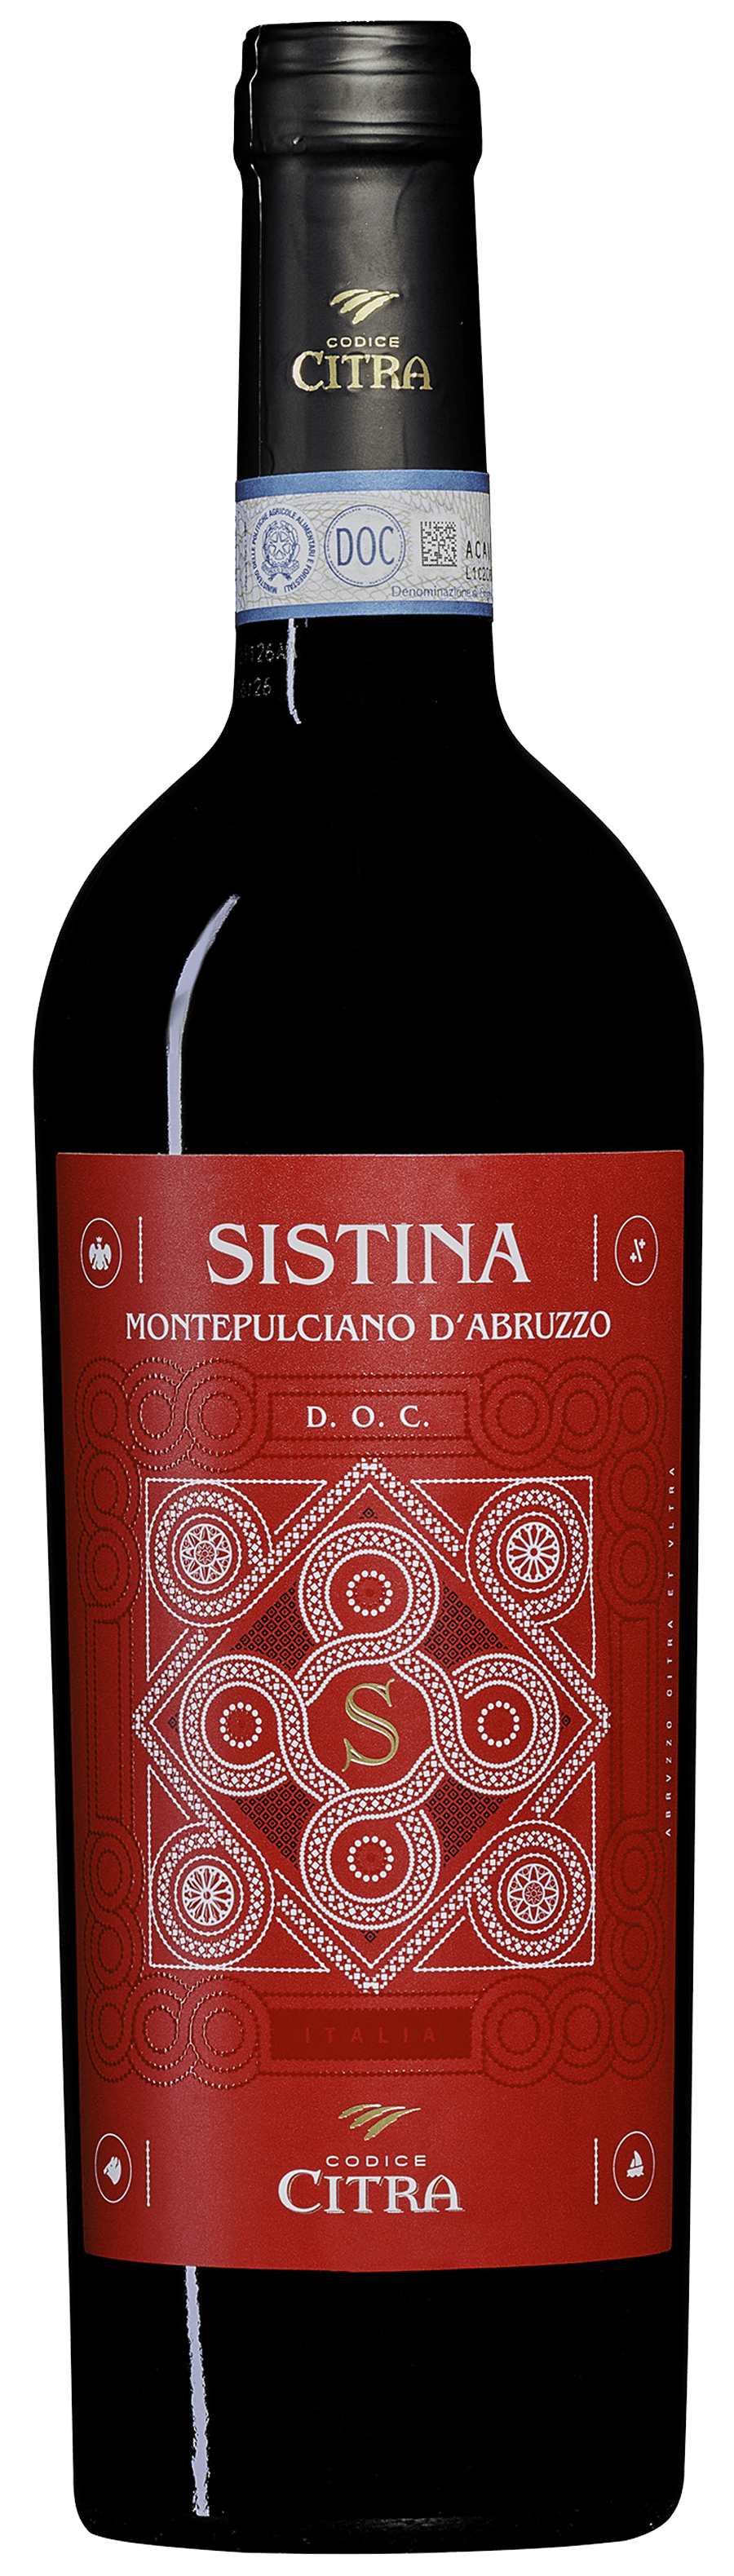 Sistina Montepulciano